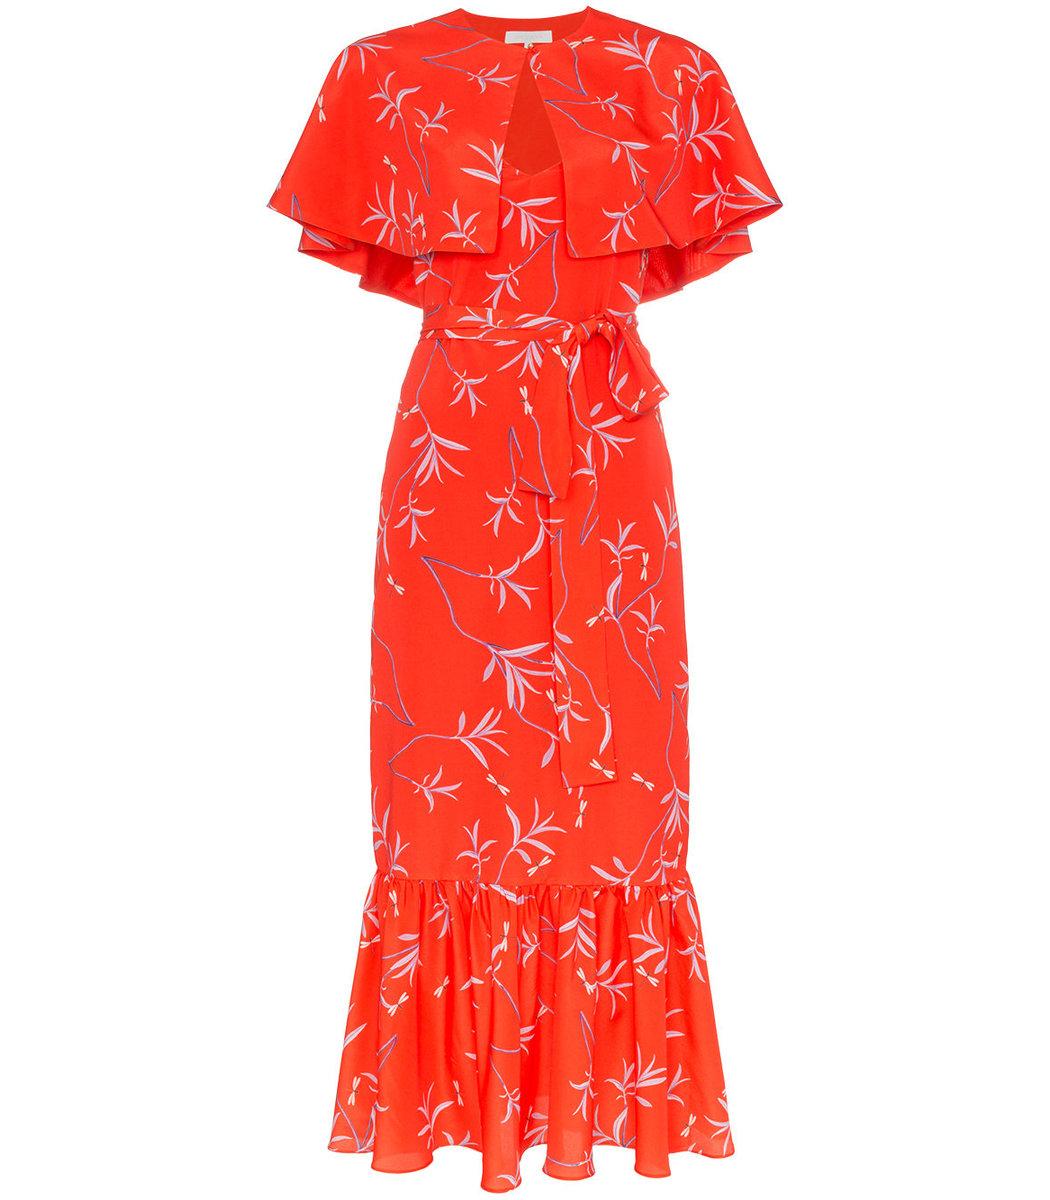 Borgo De Nor Margarita Cape Dress